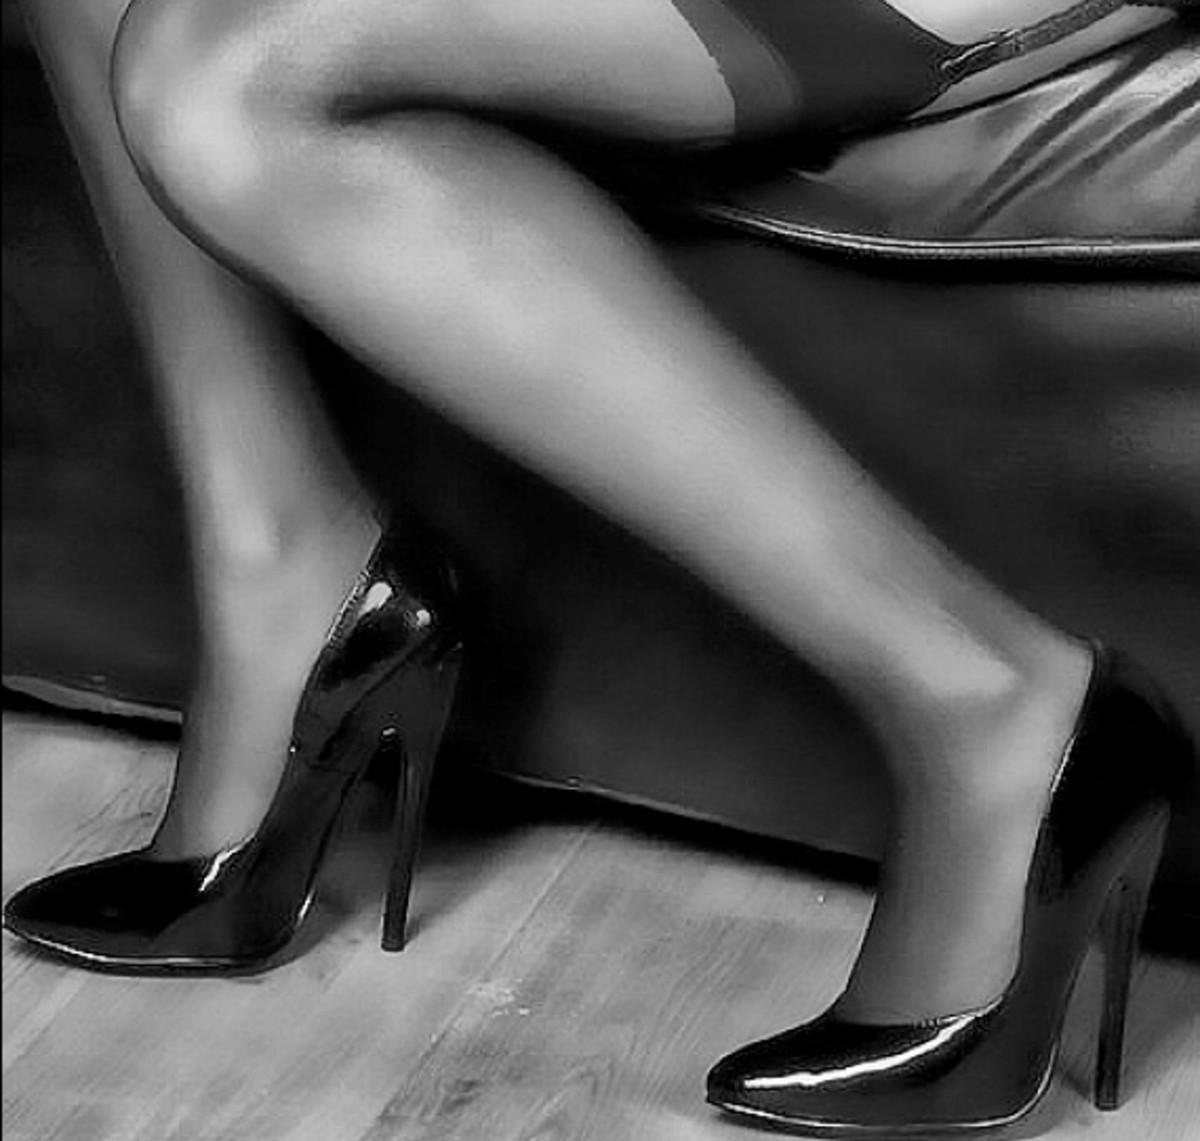 sexy legs in high heels